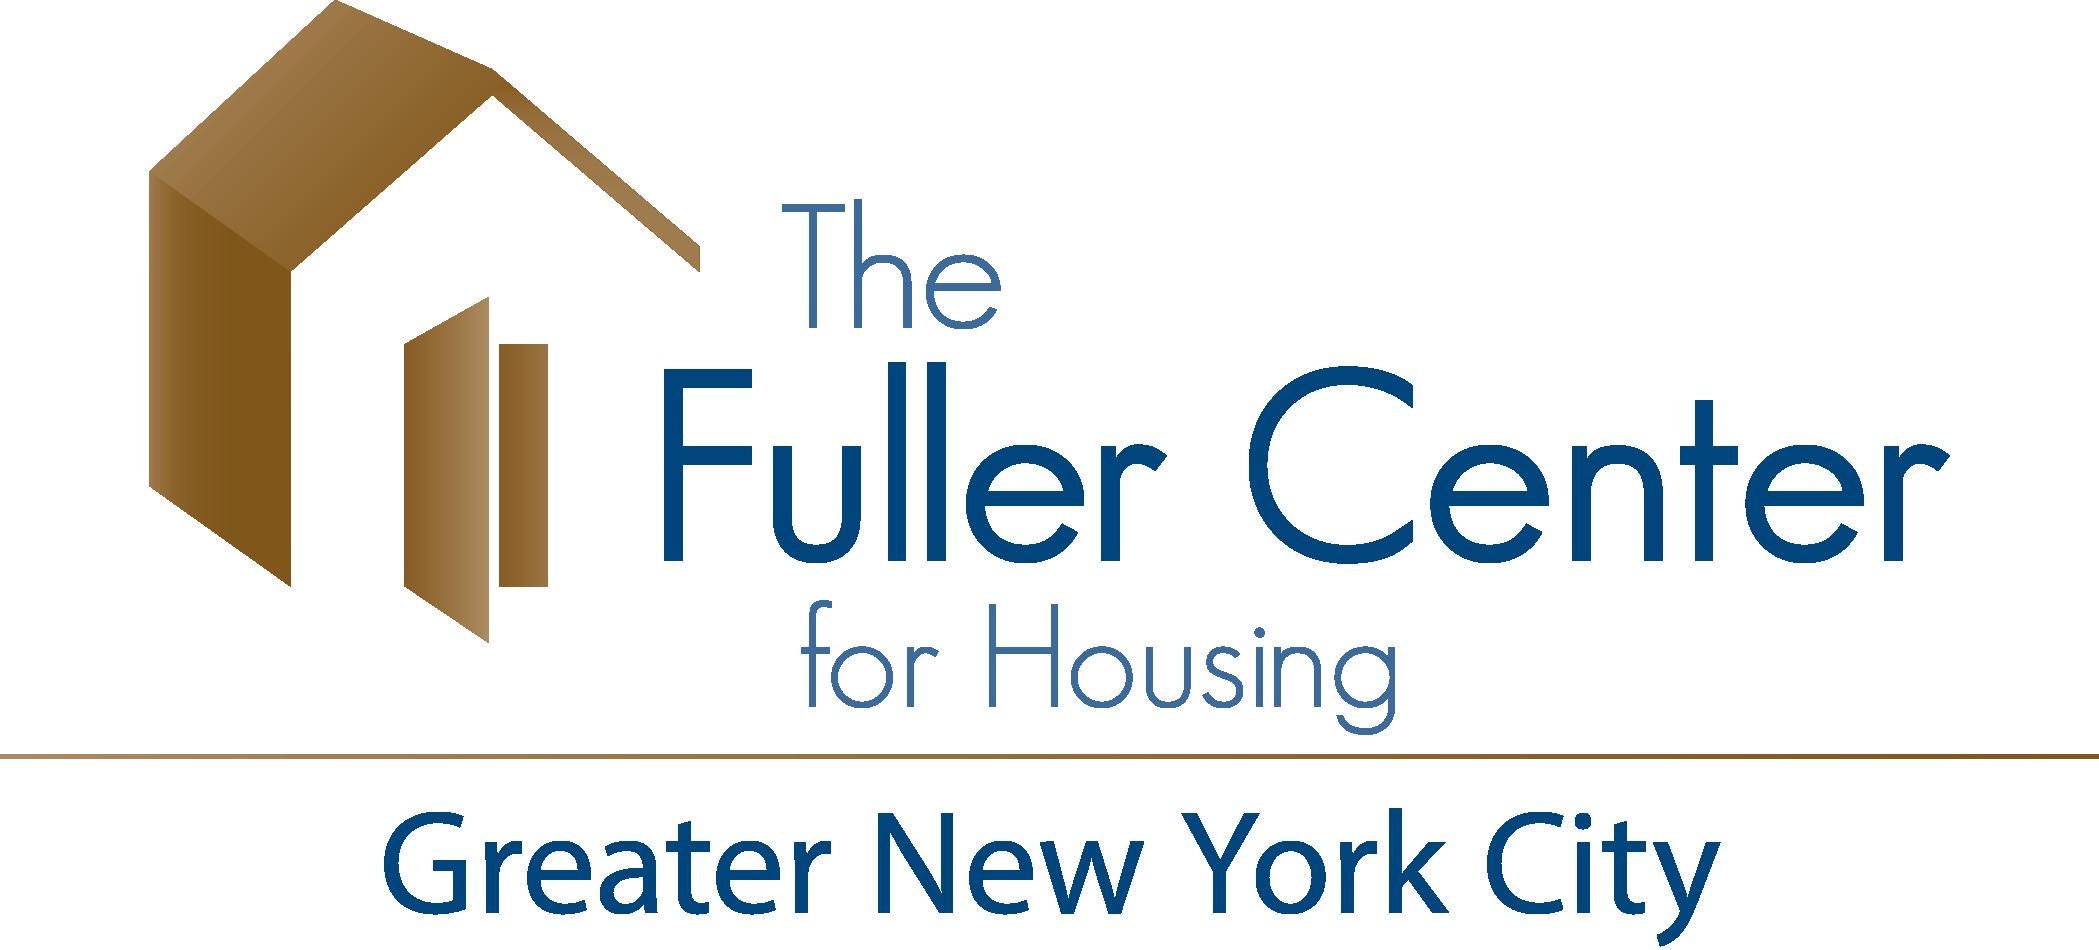 Fuller Center for Housing of Greater New York City Annual Golf Outing logo